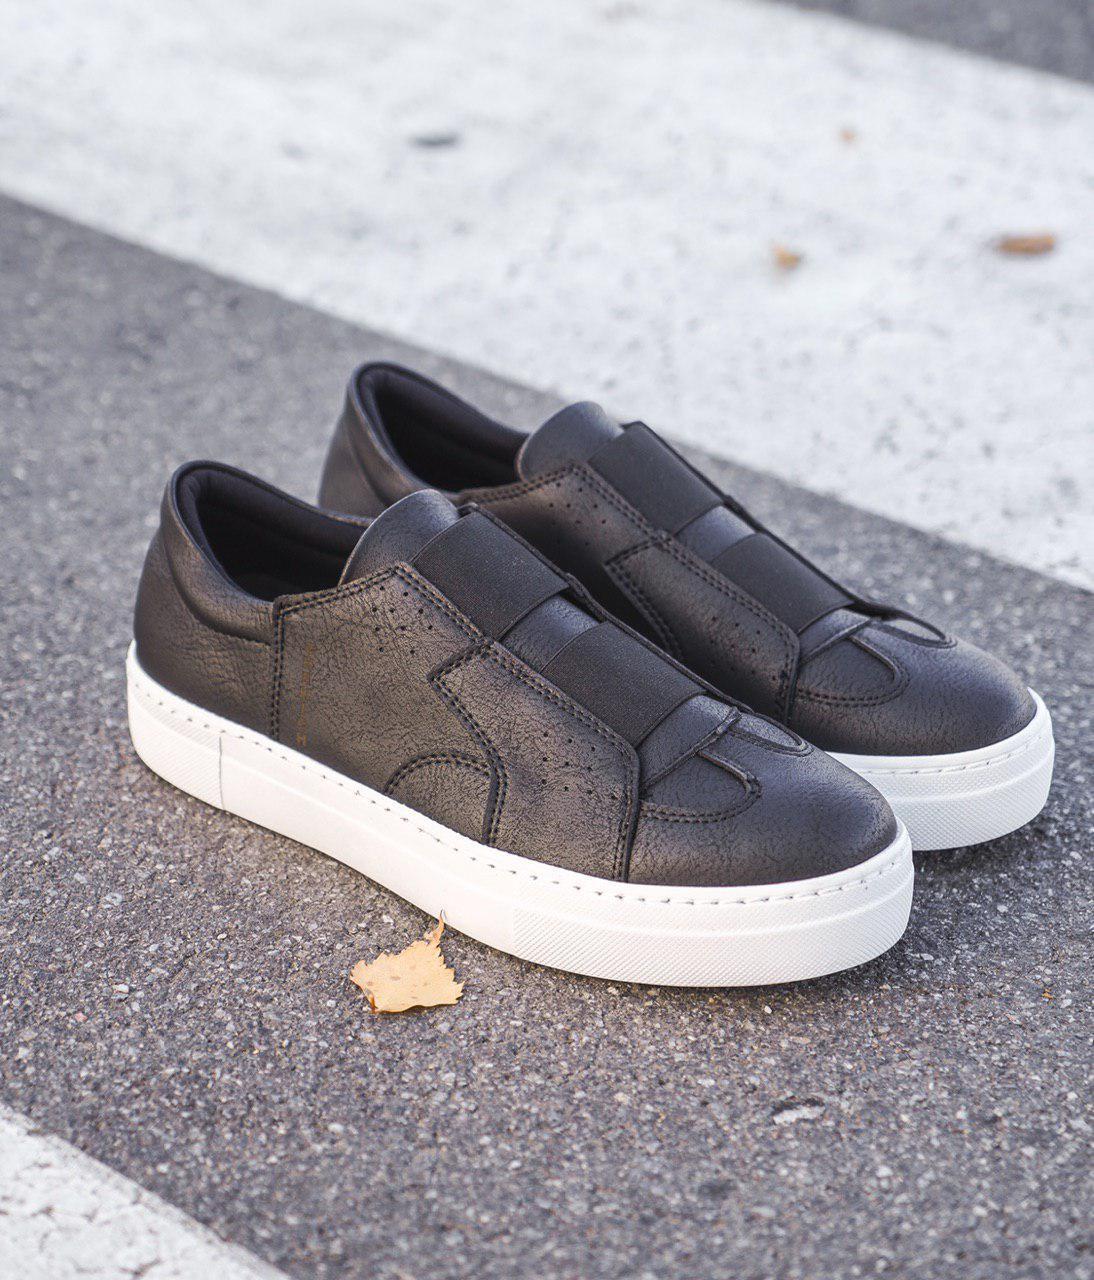 Чоловічі кросівки Chekich CH033 Black/White